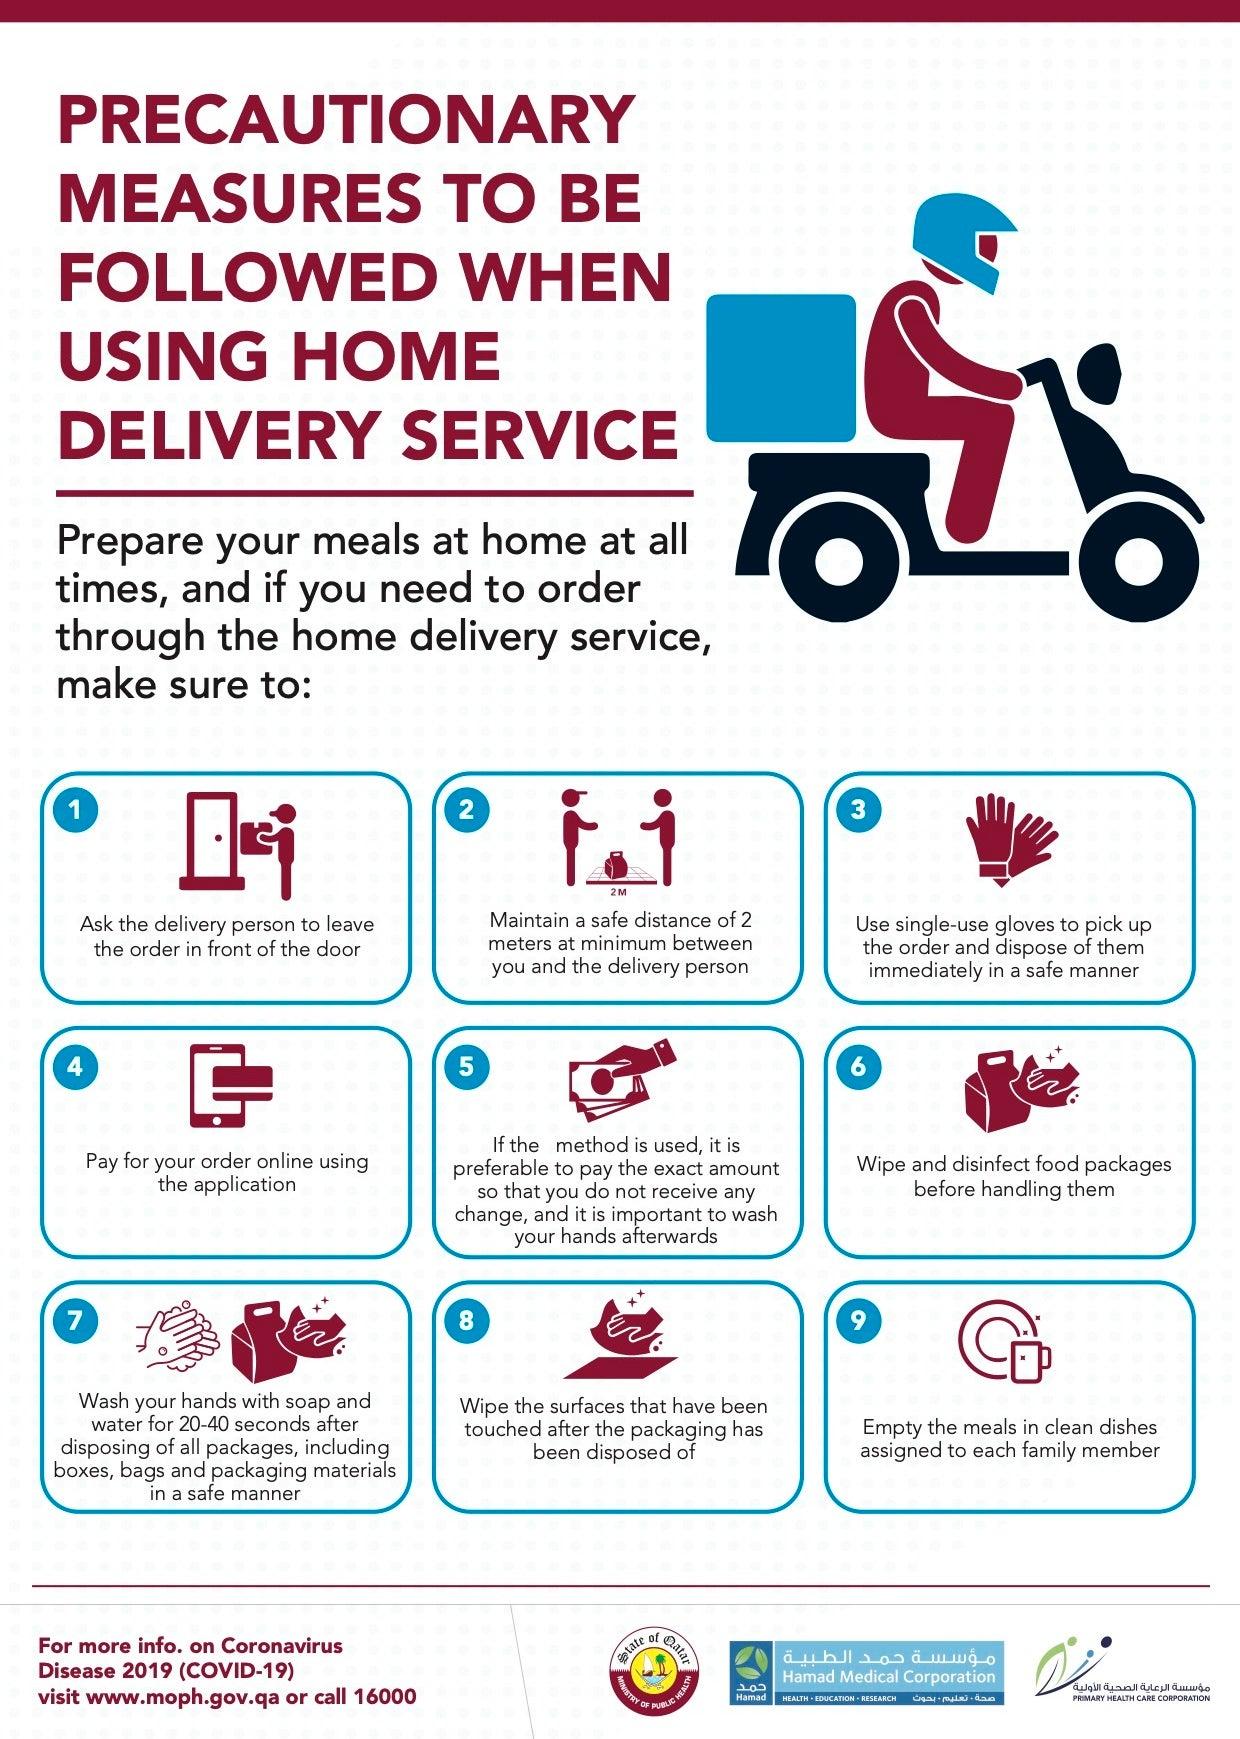 Food delivery precautions